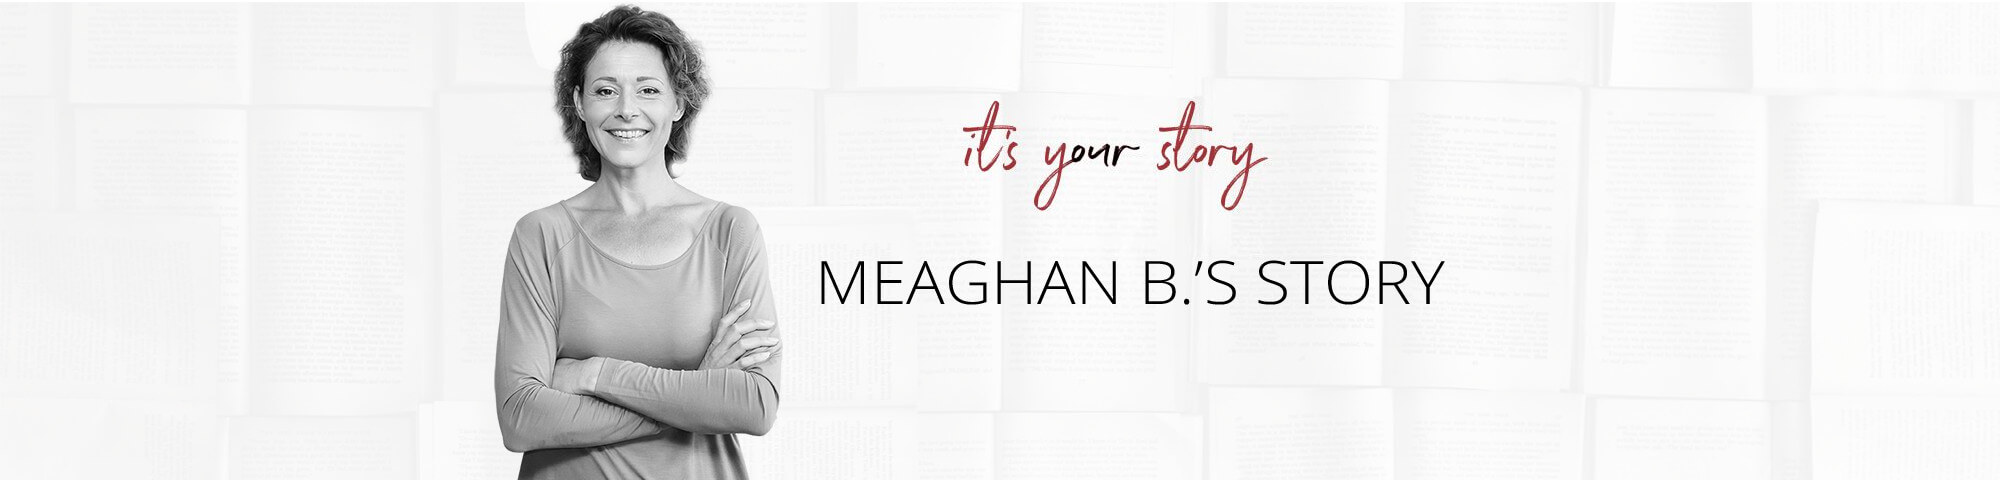 meaghan b story header